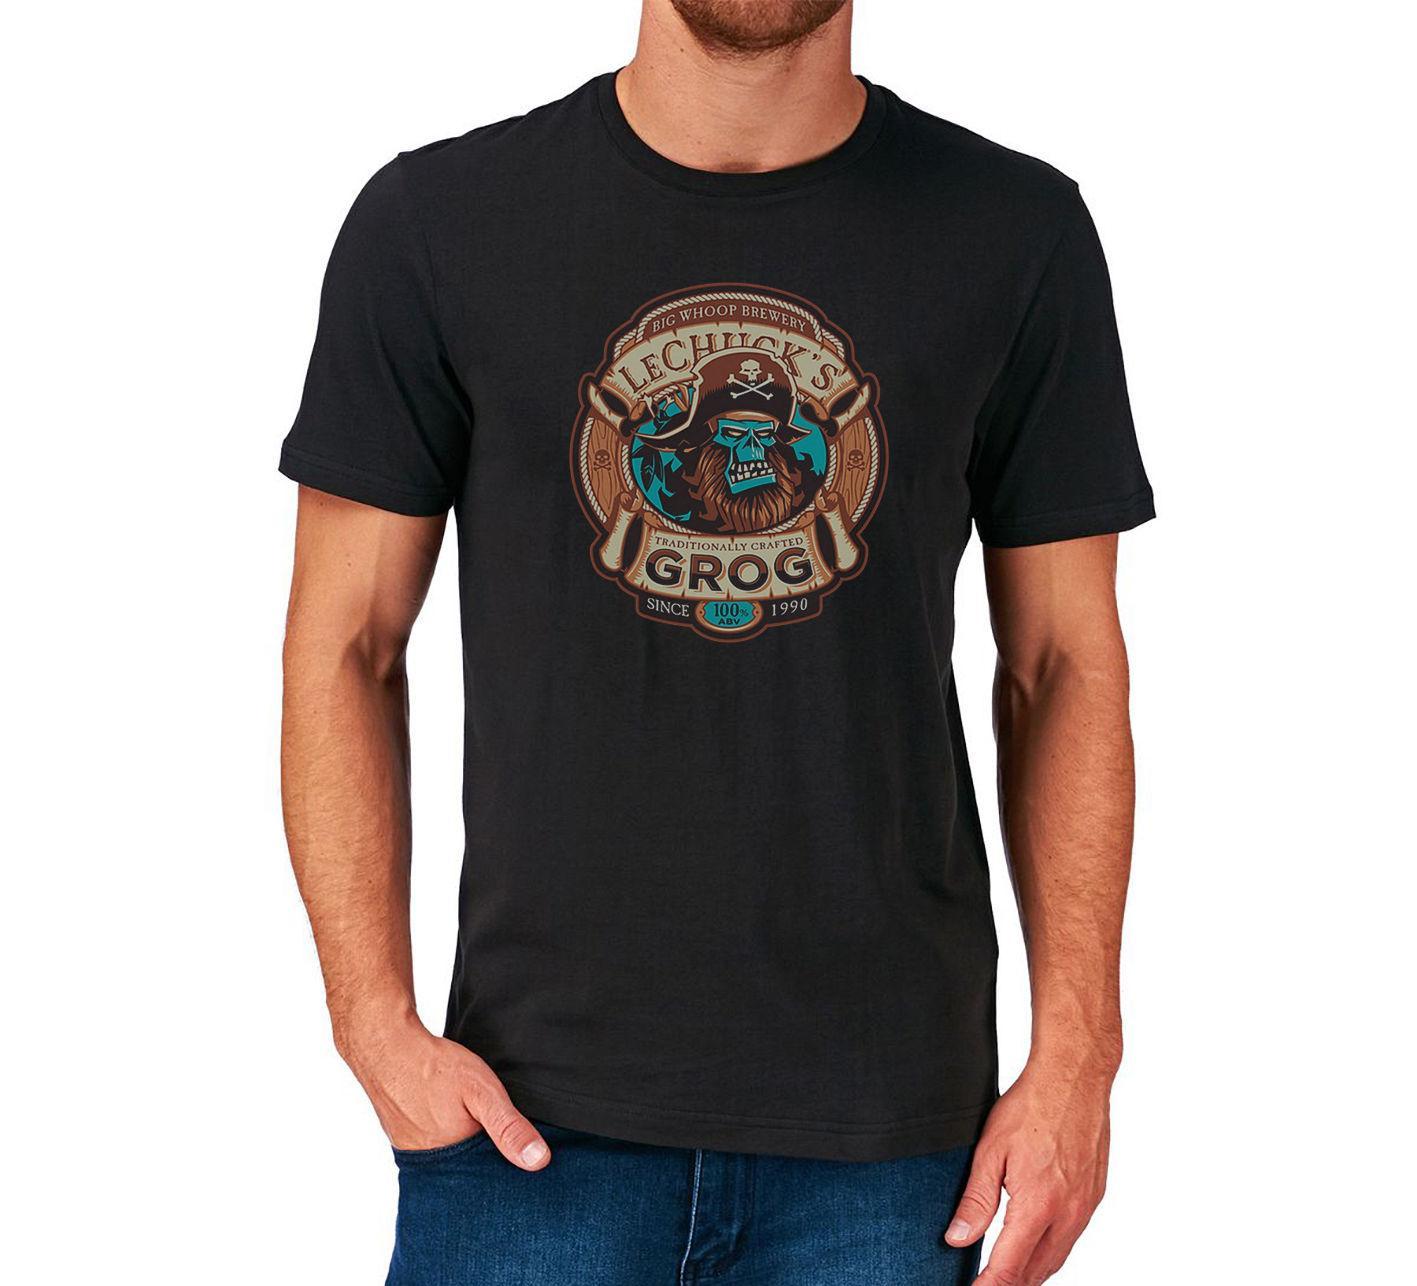 Summer Graphic T Shirt Men Tops Tees Monkey Island 2 Printed Women Funny T-shirt Short Sleeve Casual Tshirts Tops & Tees T-shirts